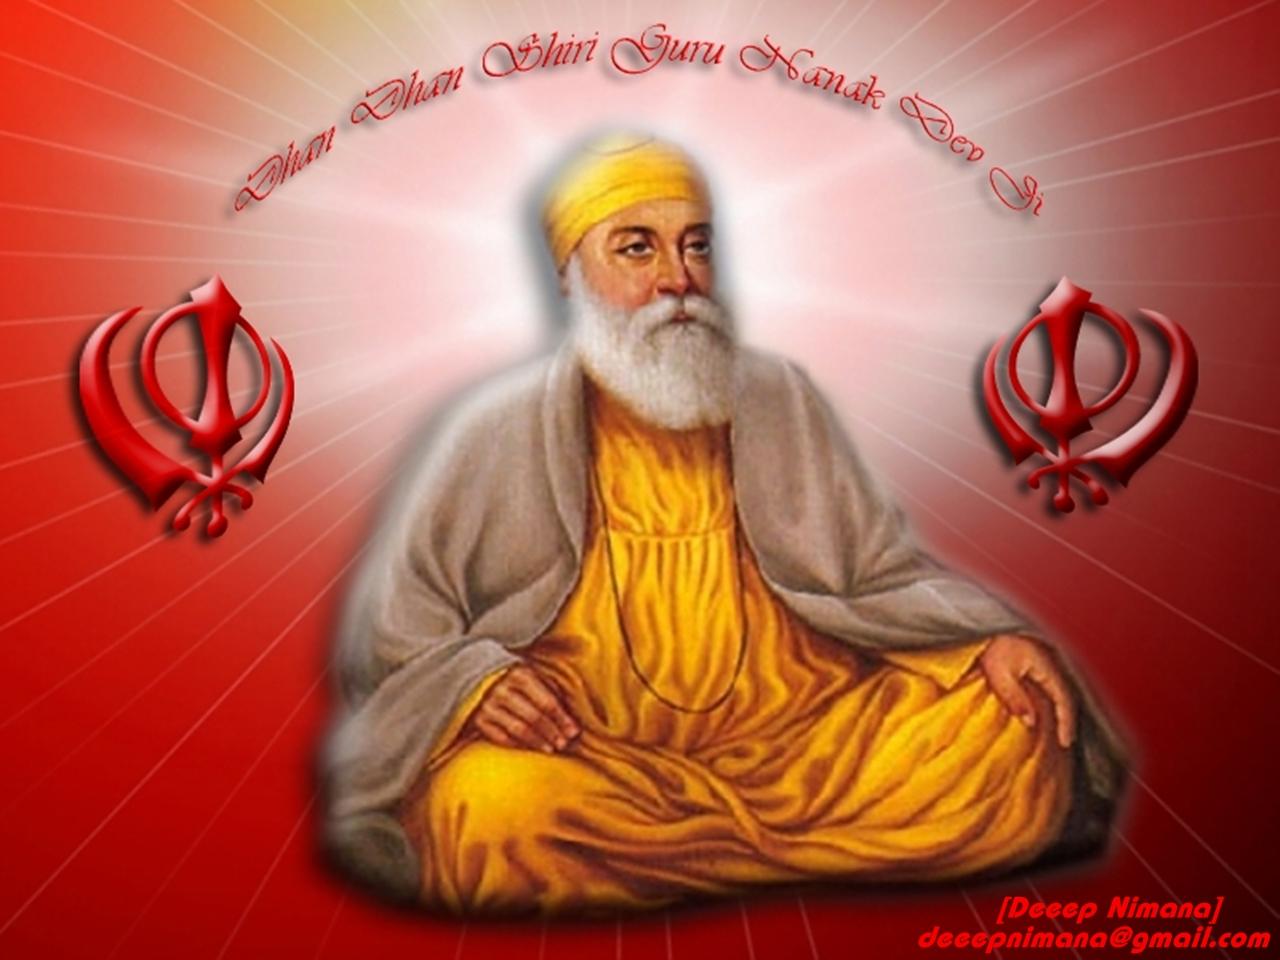 http://2.bp.blogspot.com/-8teFds_CobI/T-mx7gXDcgI/AAAAAAAAC8A/Evv5lDyWc_M/s1600/Guru-Nanak-Dev-Ji.jpg